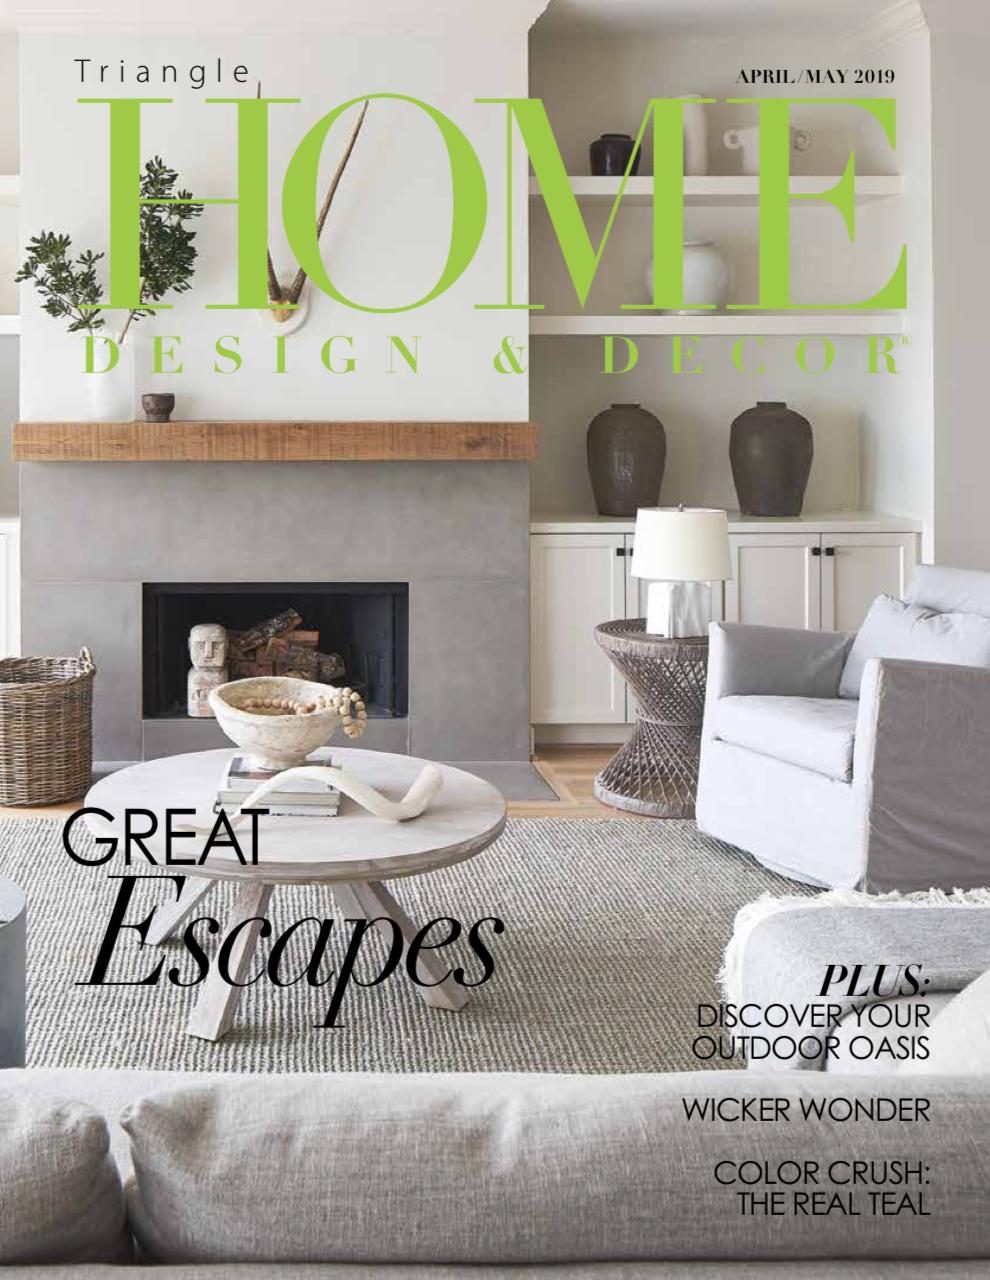 Triangle Home Design + Decor